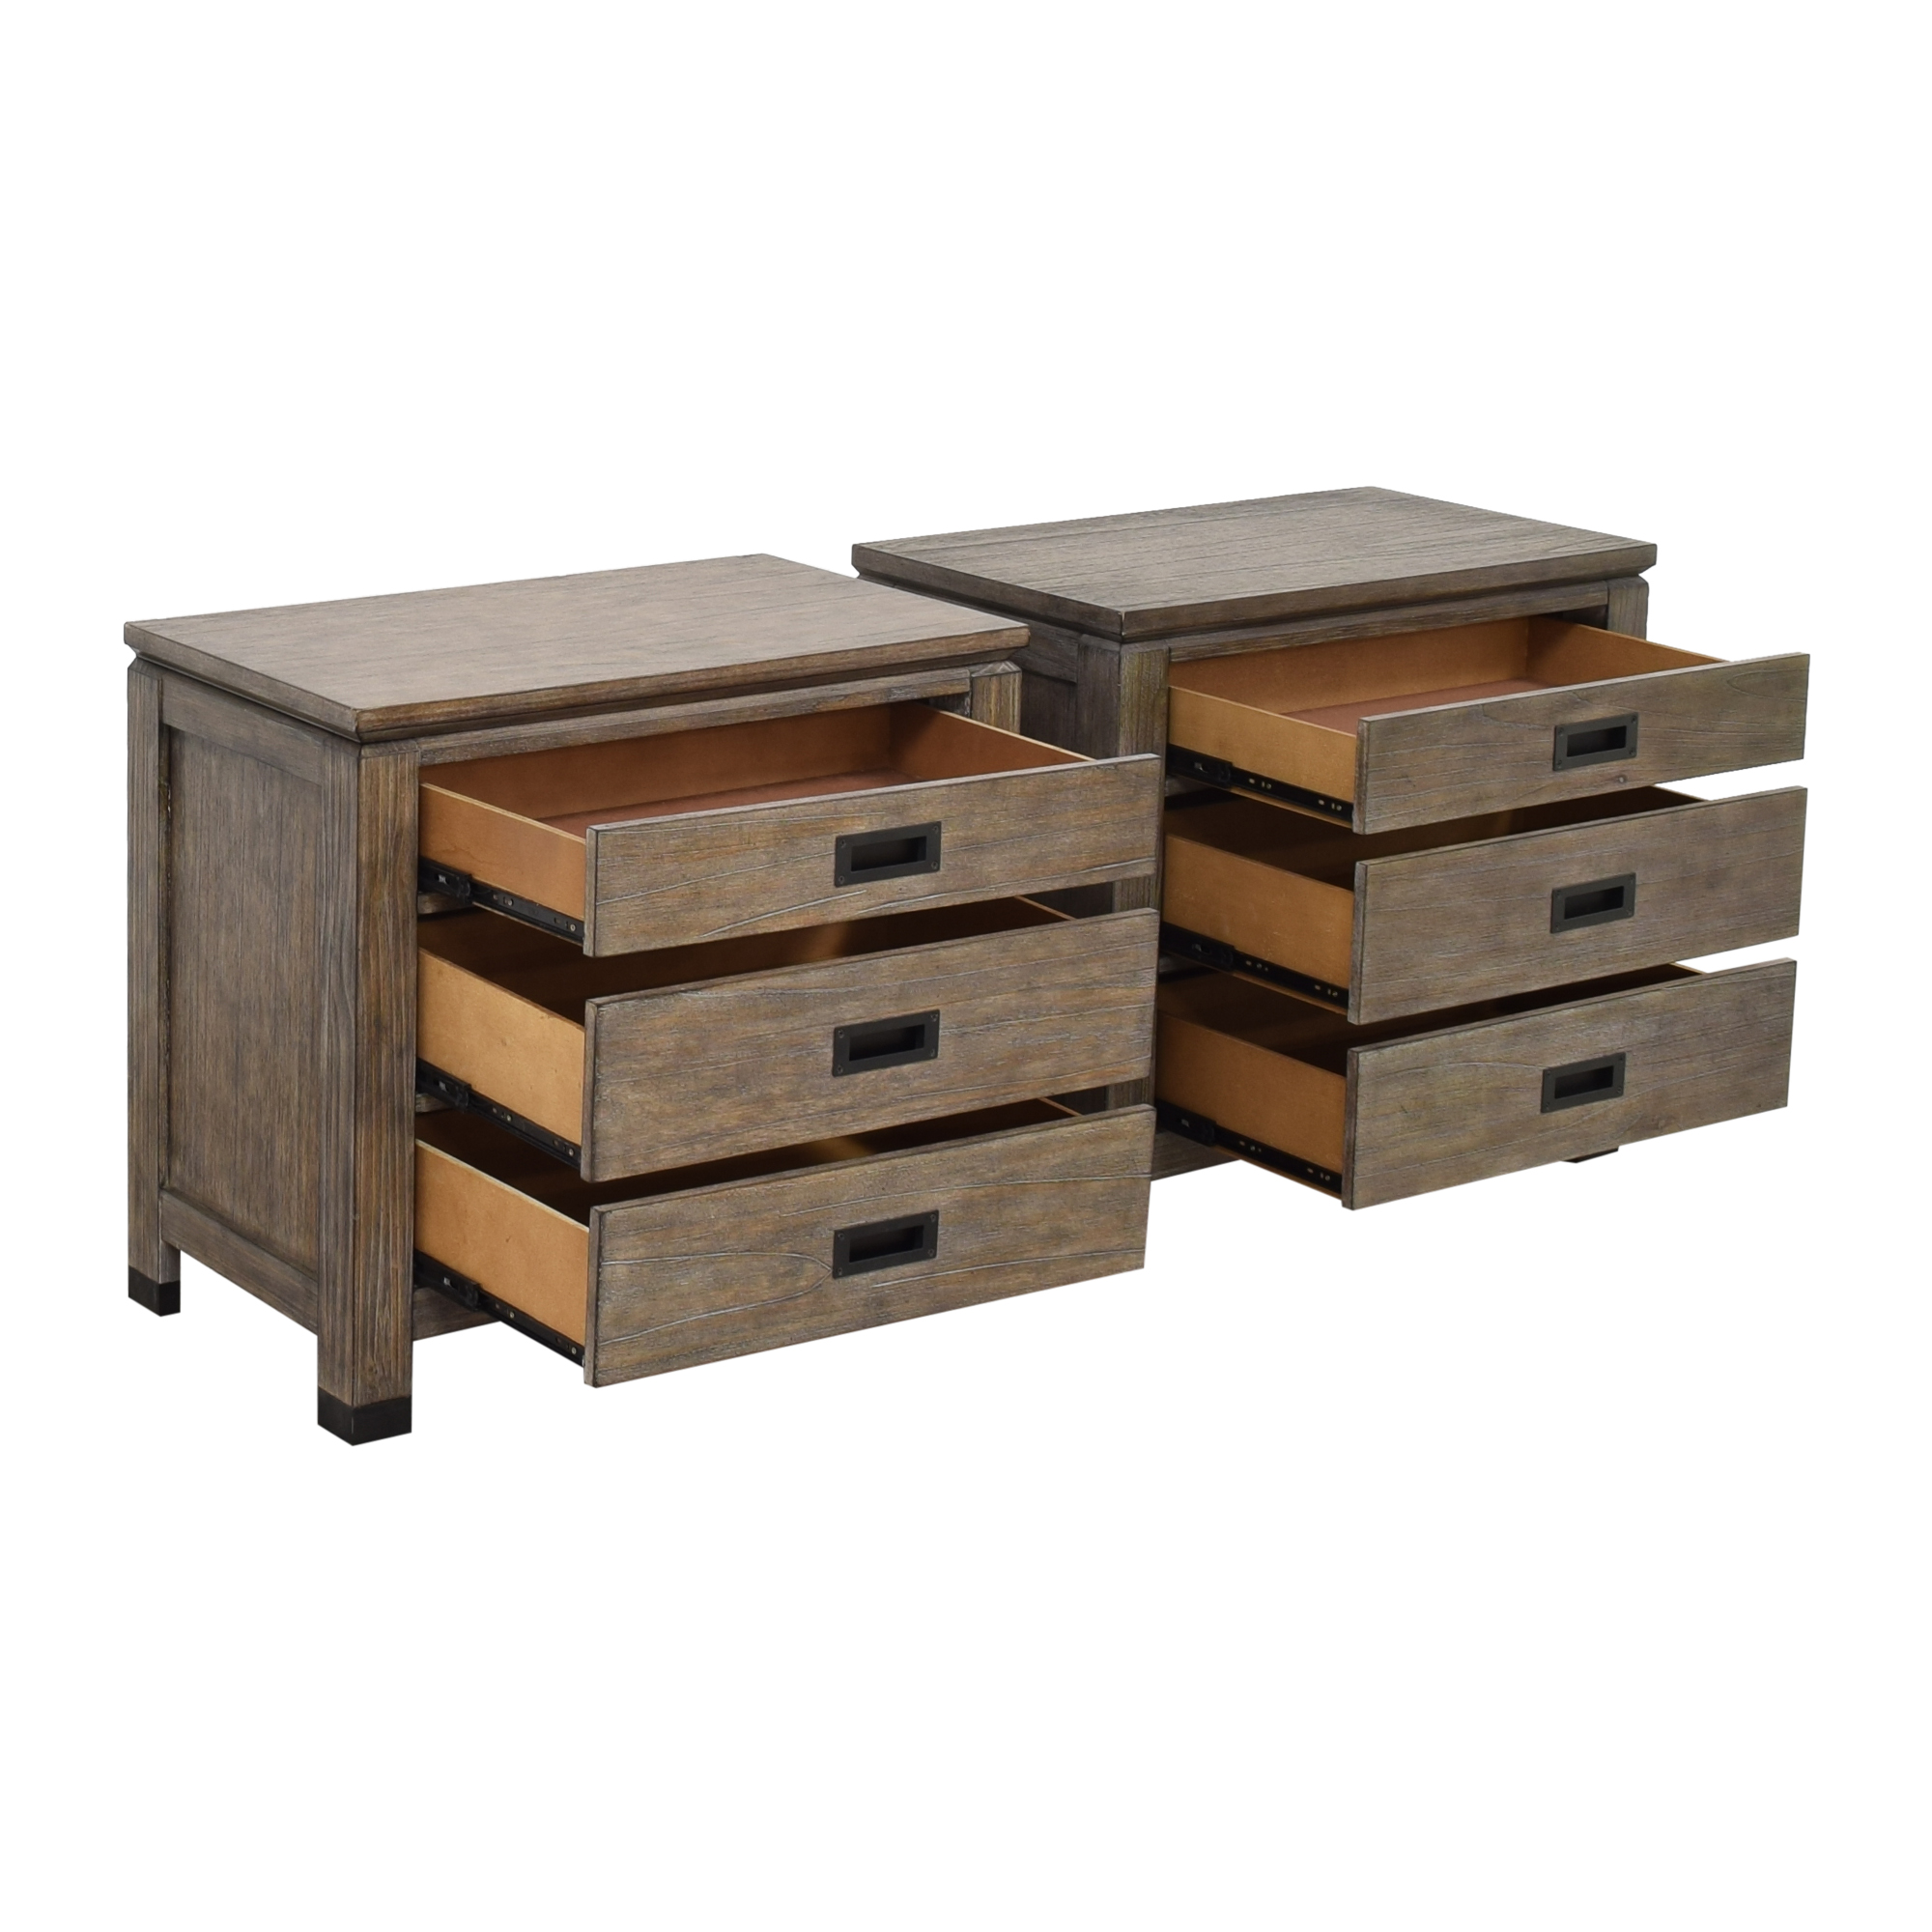 shop Coaster Fine Furniture Coaster Fine Furniture Furniture Meester Night Stands online